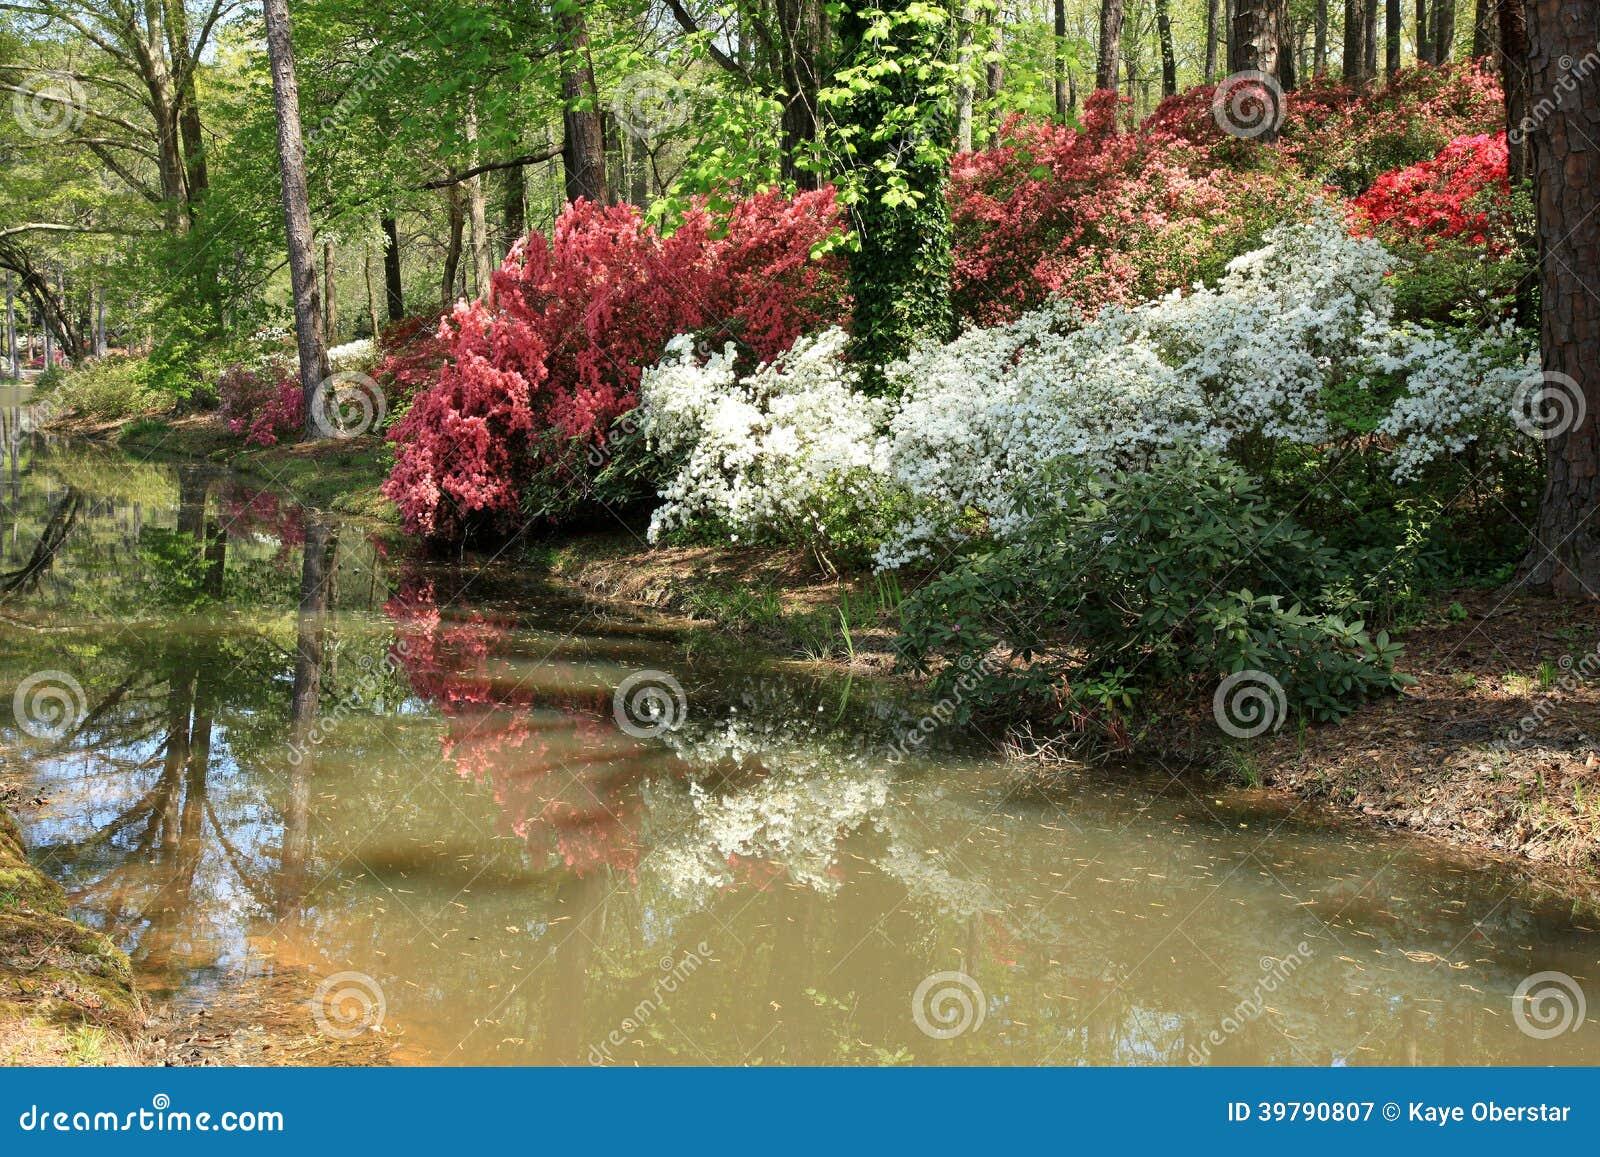 Azaleas at callaway gardens stock image image 39790807 - Callaway gardens pine mountain georgia ...